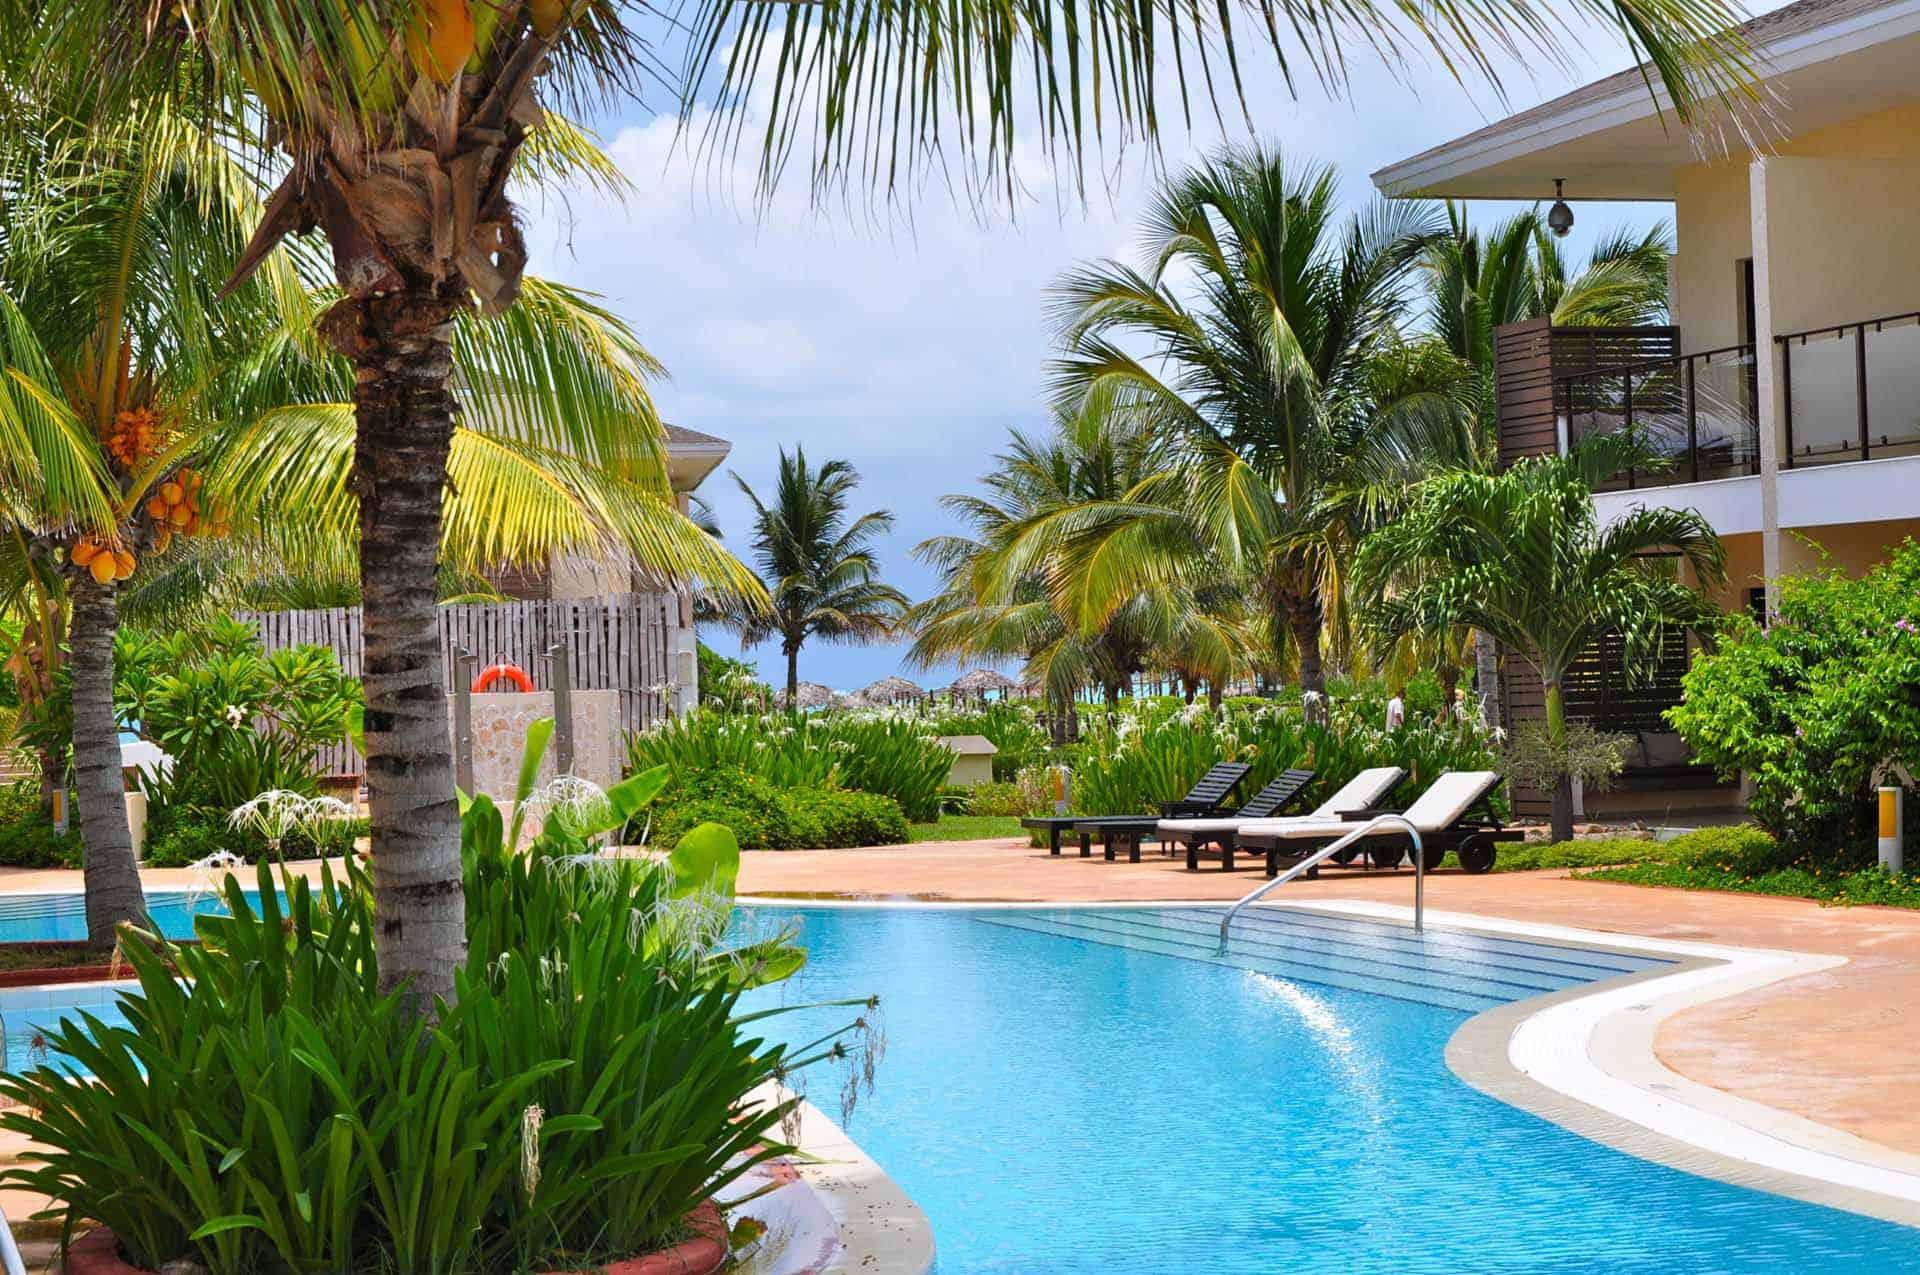 cayo santa maria hotel piscine palmiers cuba autrement 2